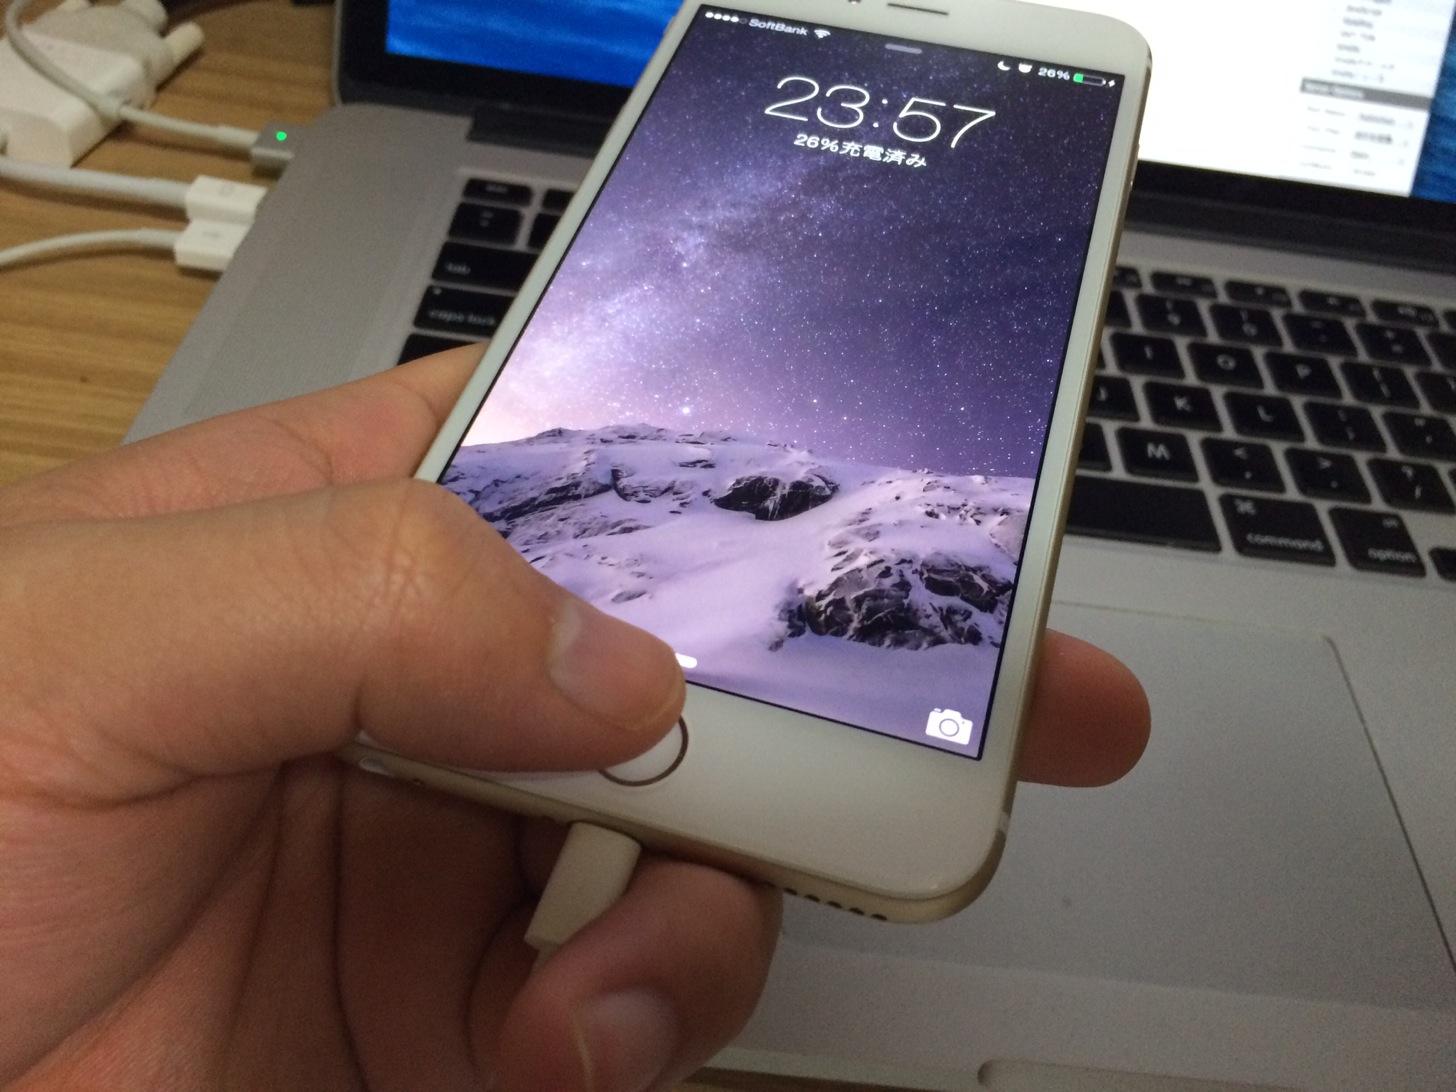 iPhoneのロック画面にいき、ホームボタンに指紋を登録した指を当てます。